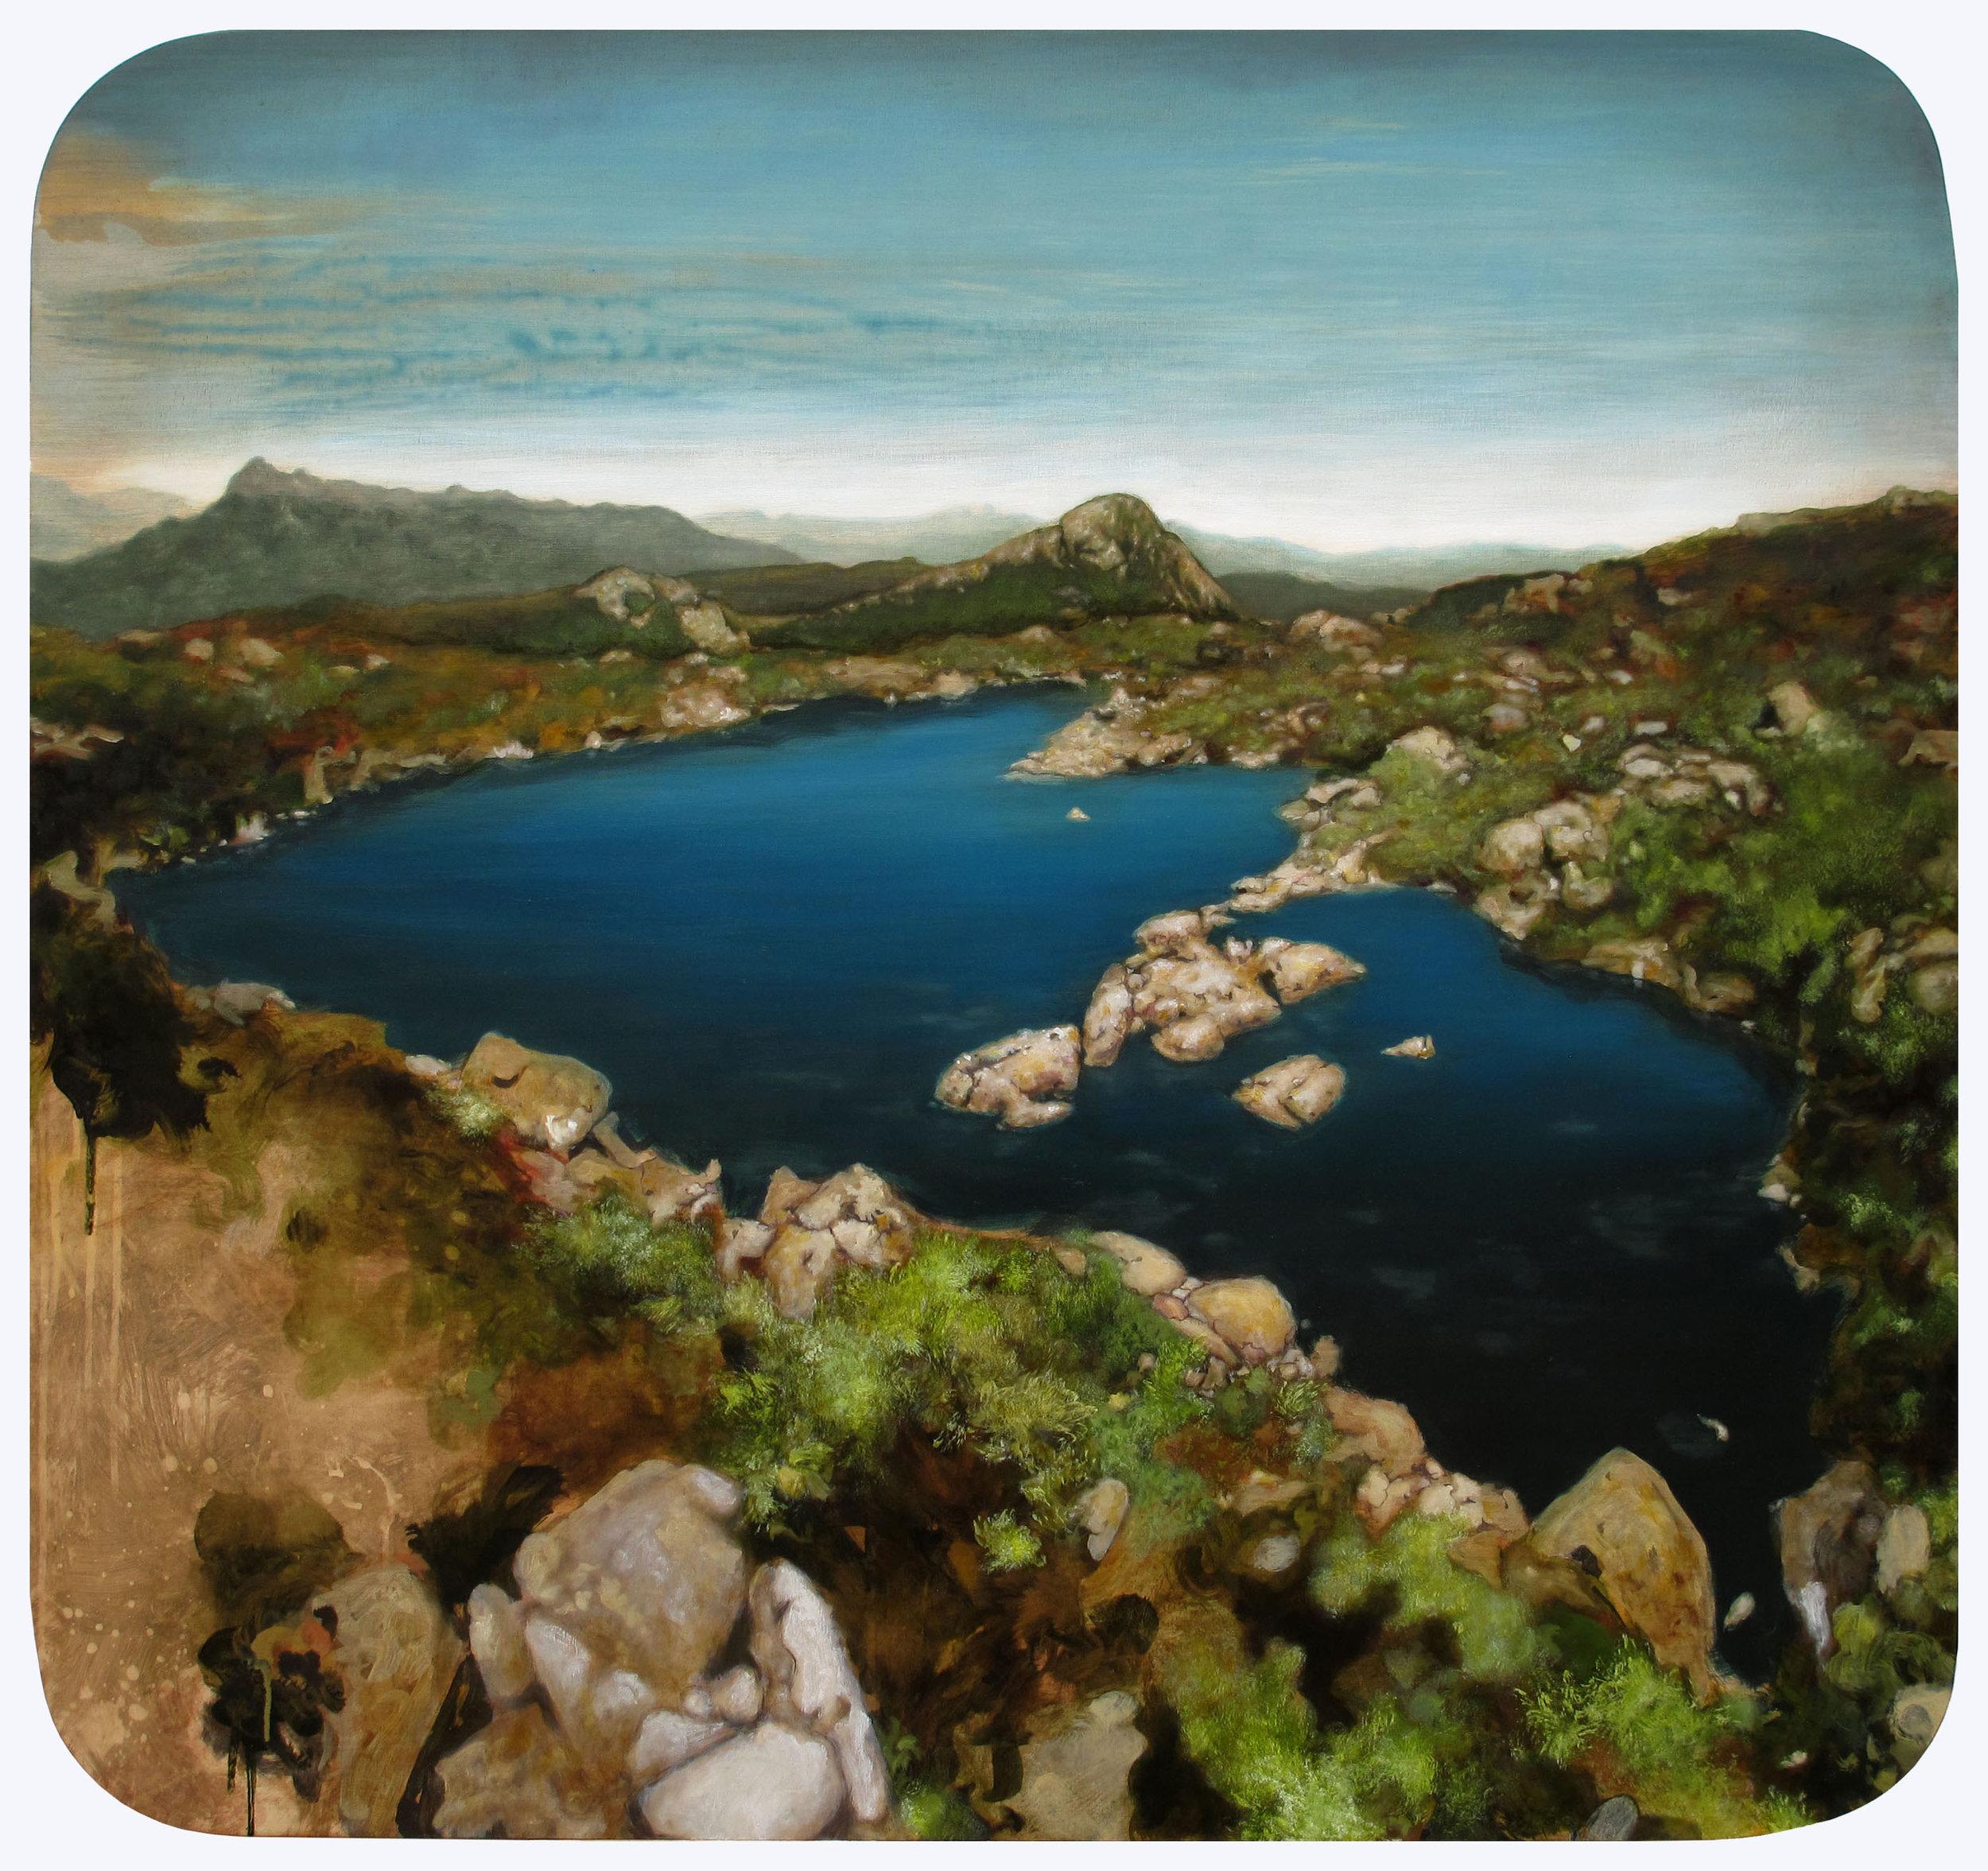 MARK RODDA  Looking South-East from the Mt Eliza Plateau, Tasmania  2014  acrylic and oil on marine ply 103 × 110 cm